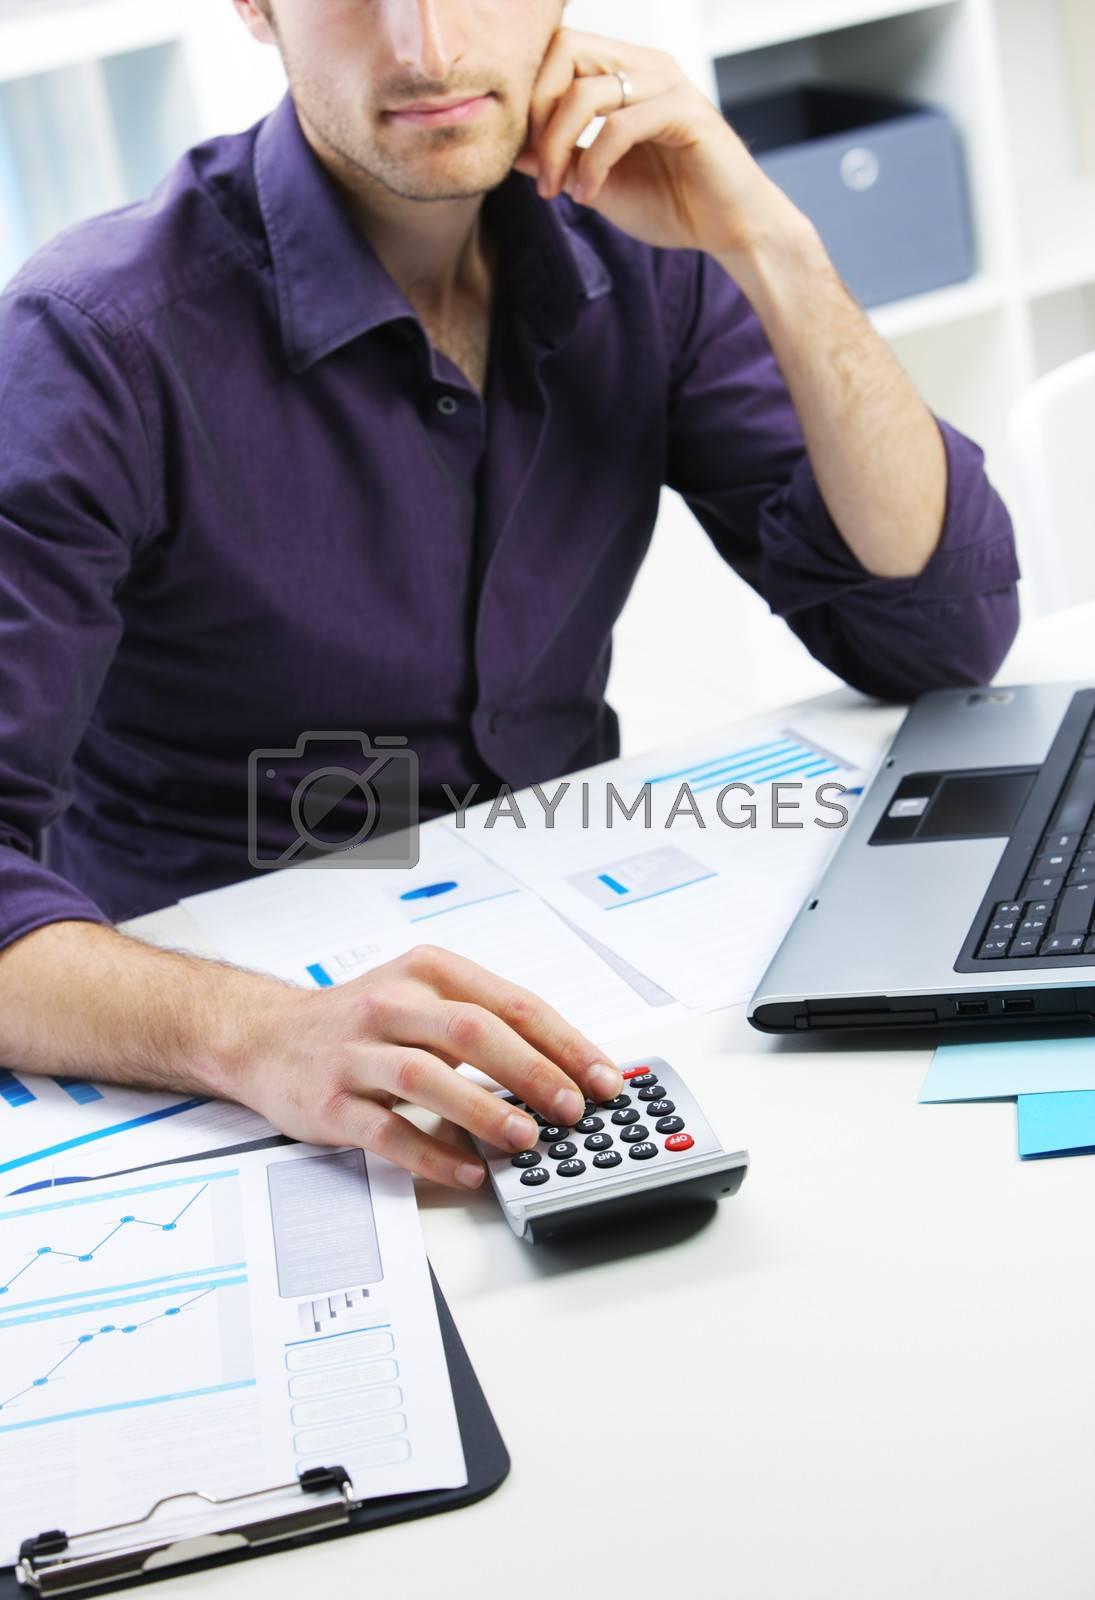 Business man checking financial data on calculator.